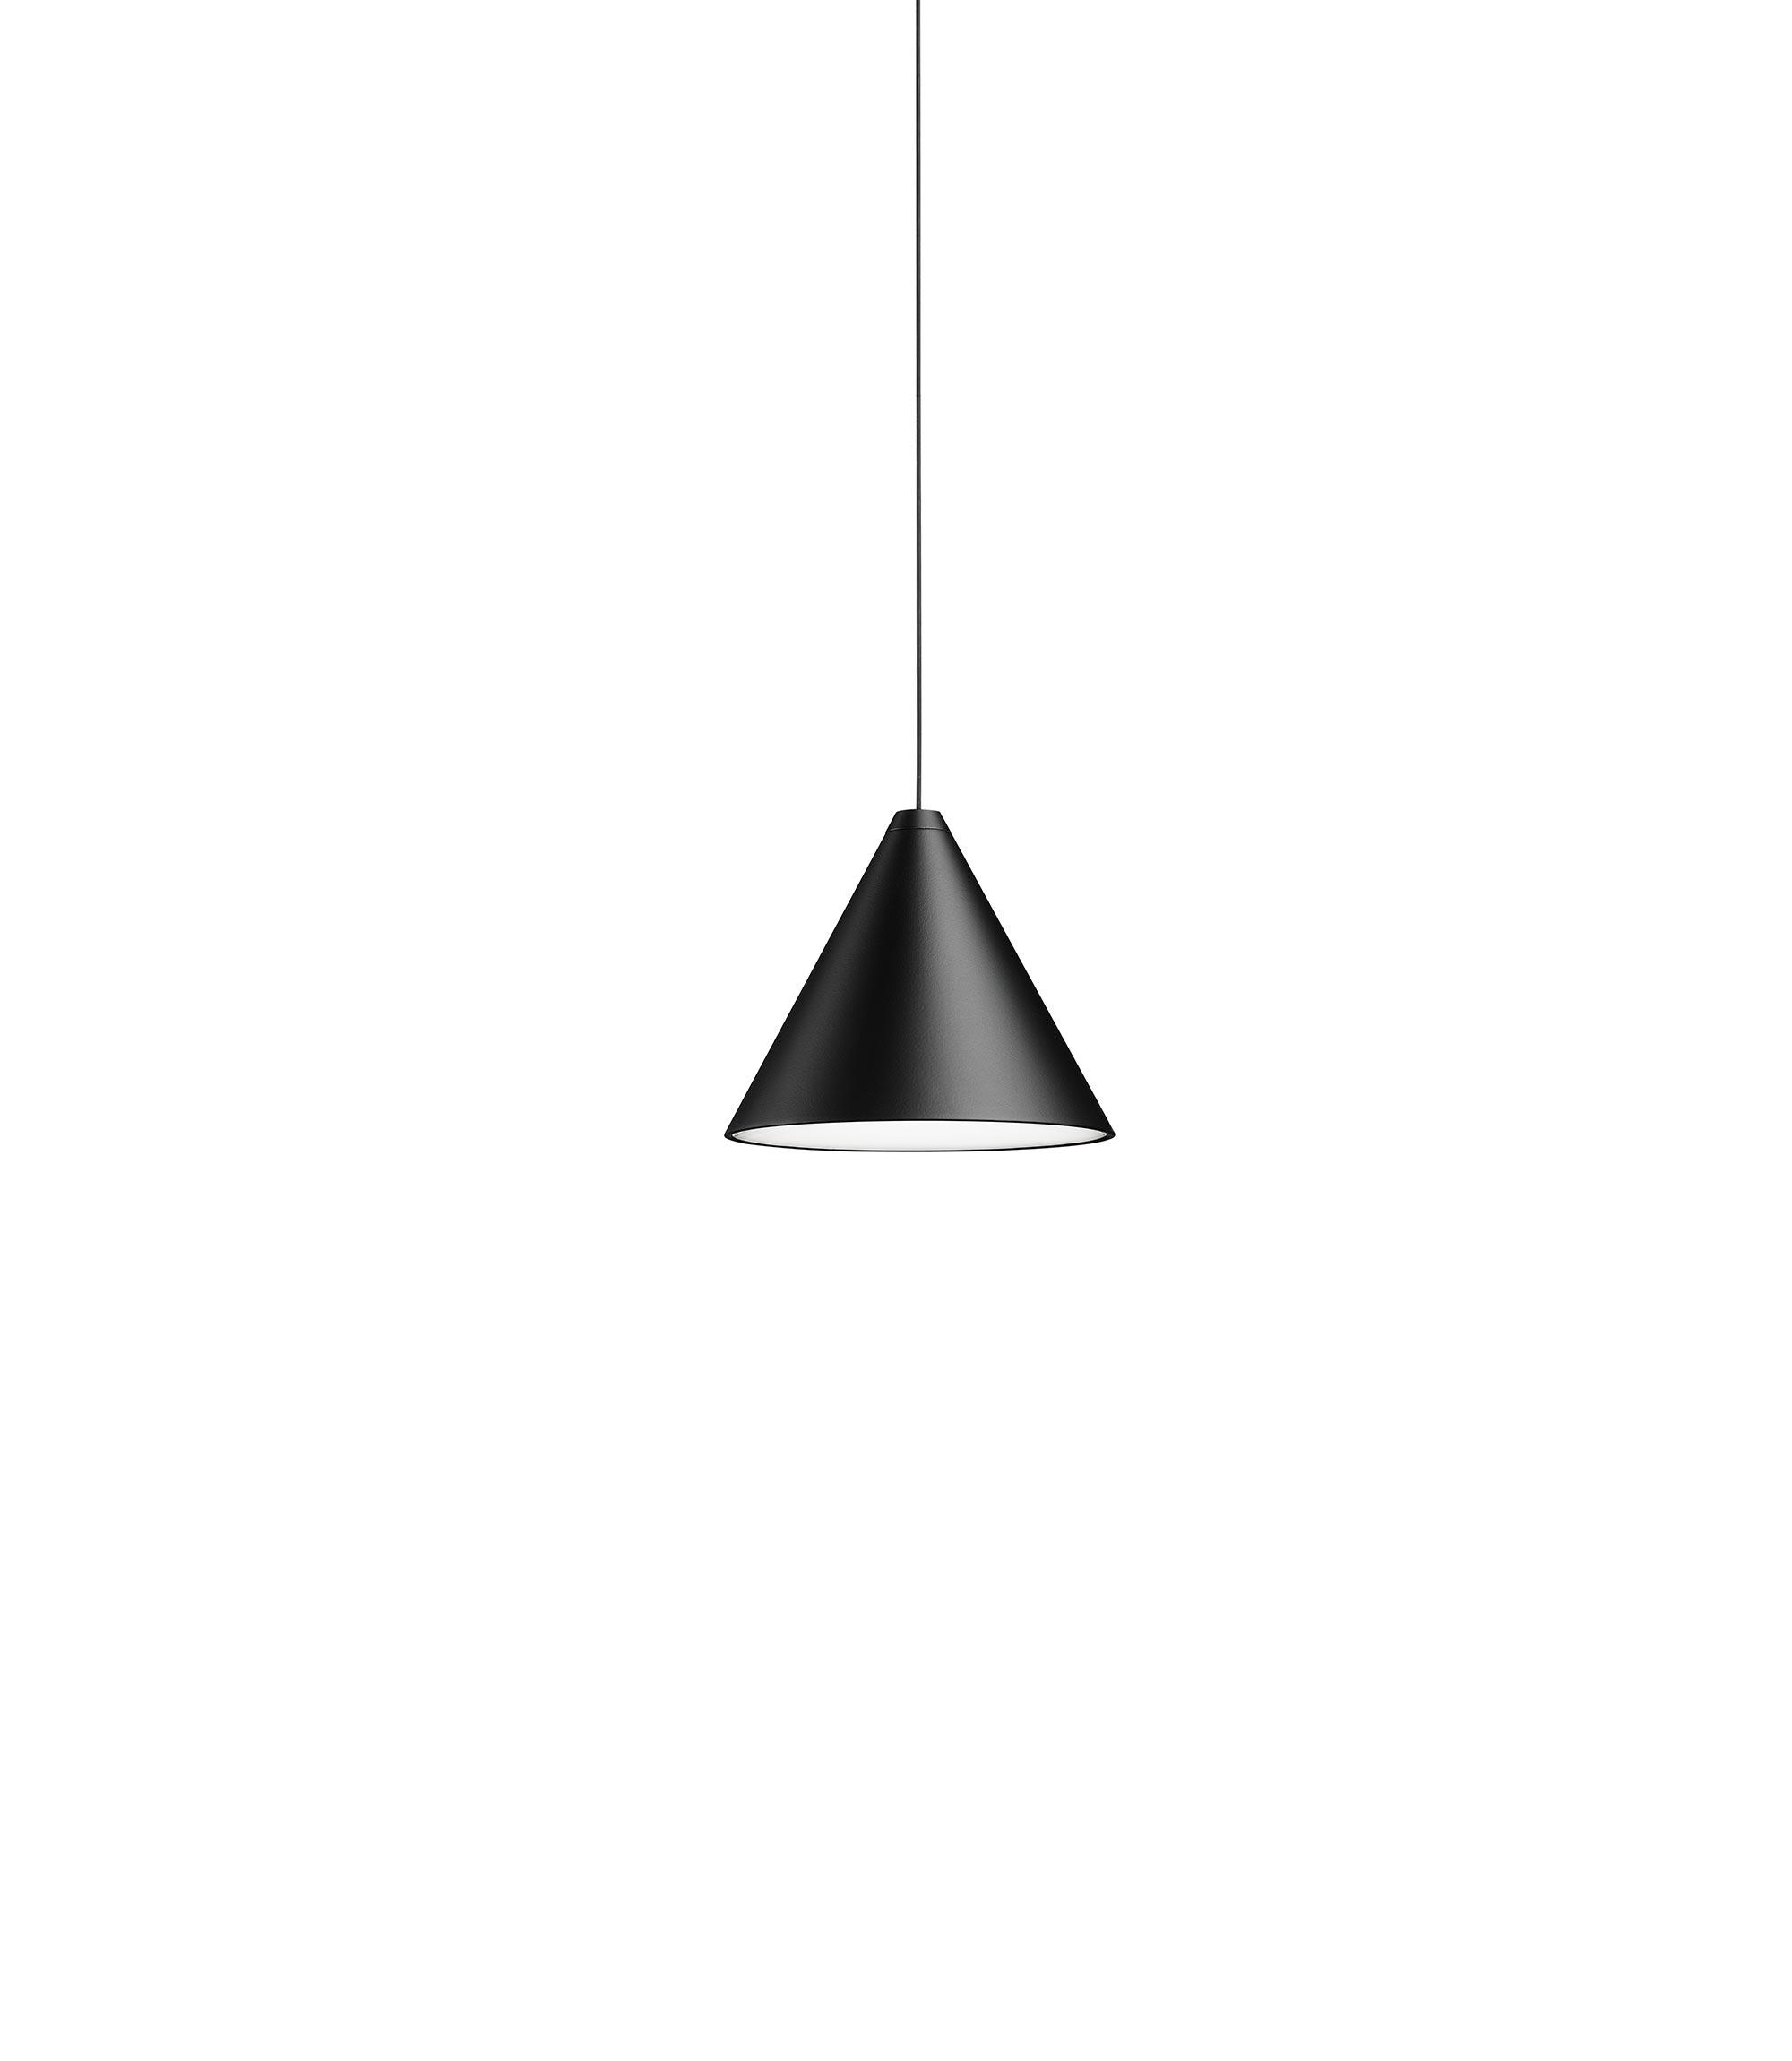 String light suspension cone anastassiades flos F6491030 product still life big